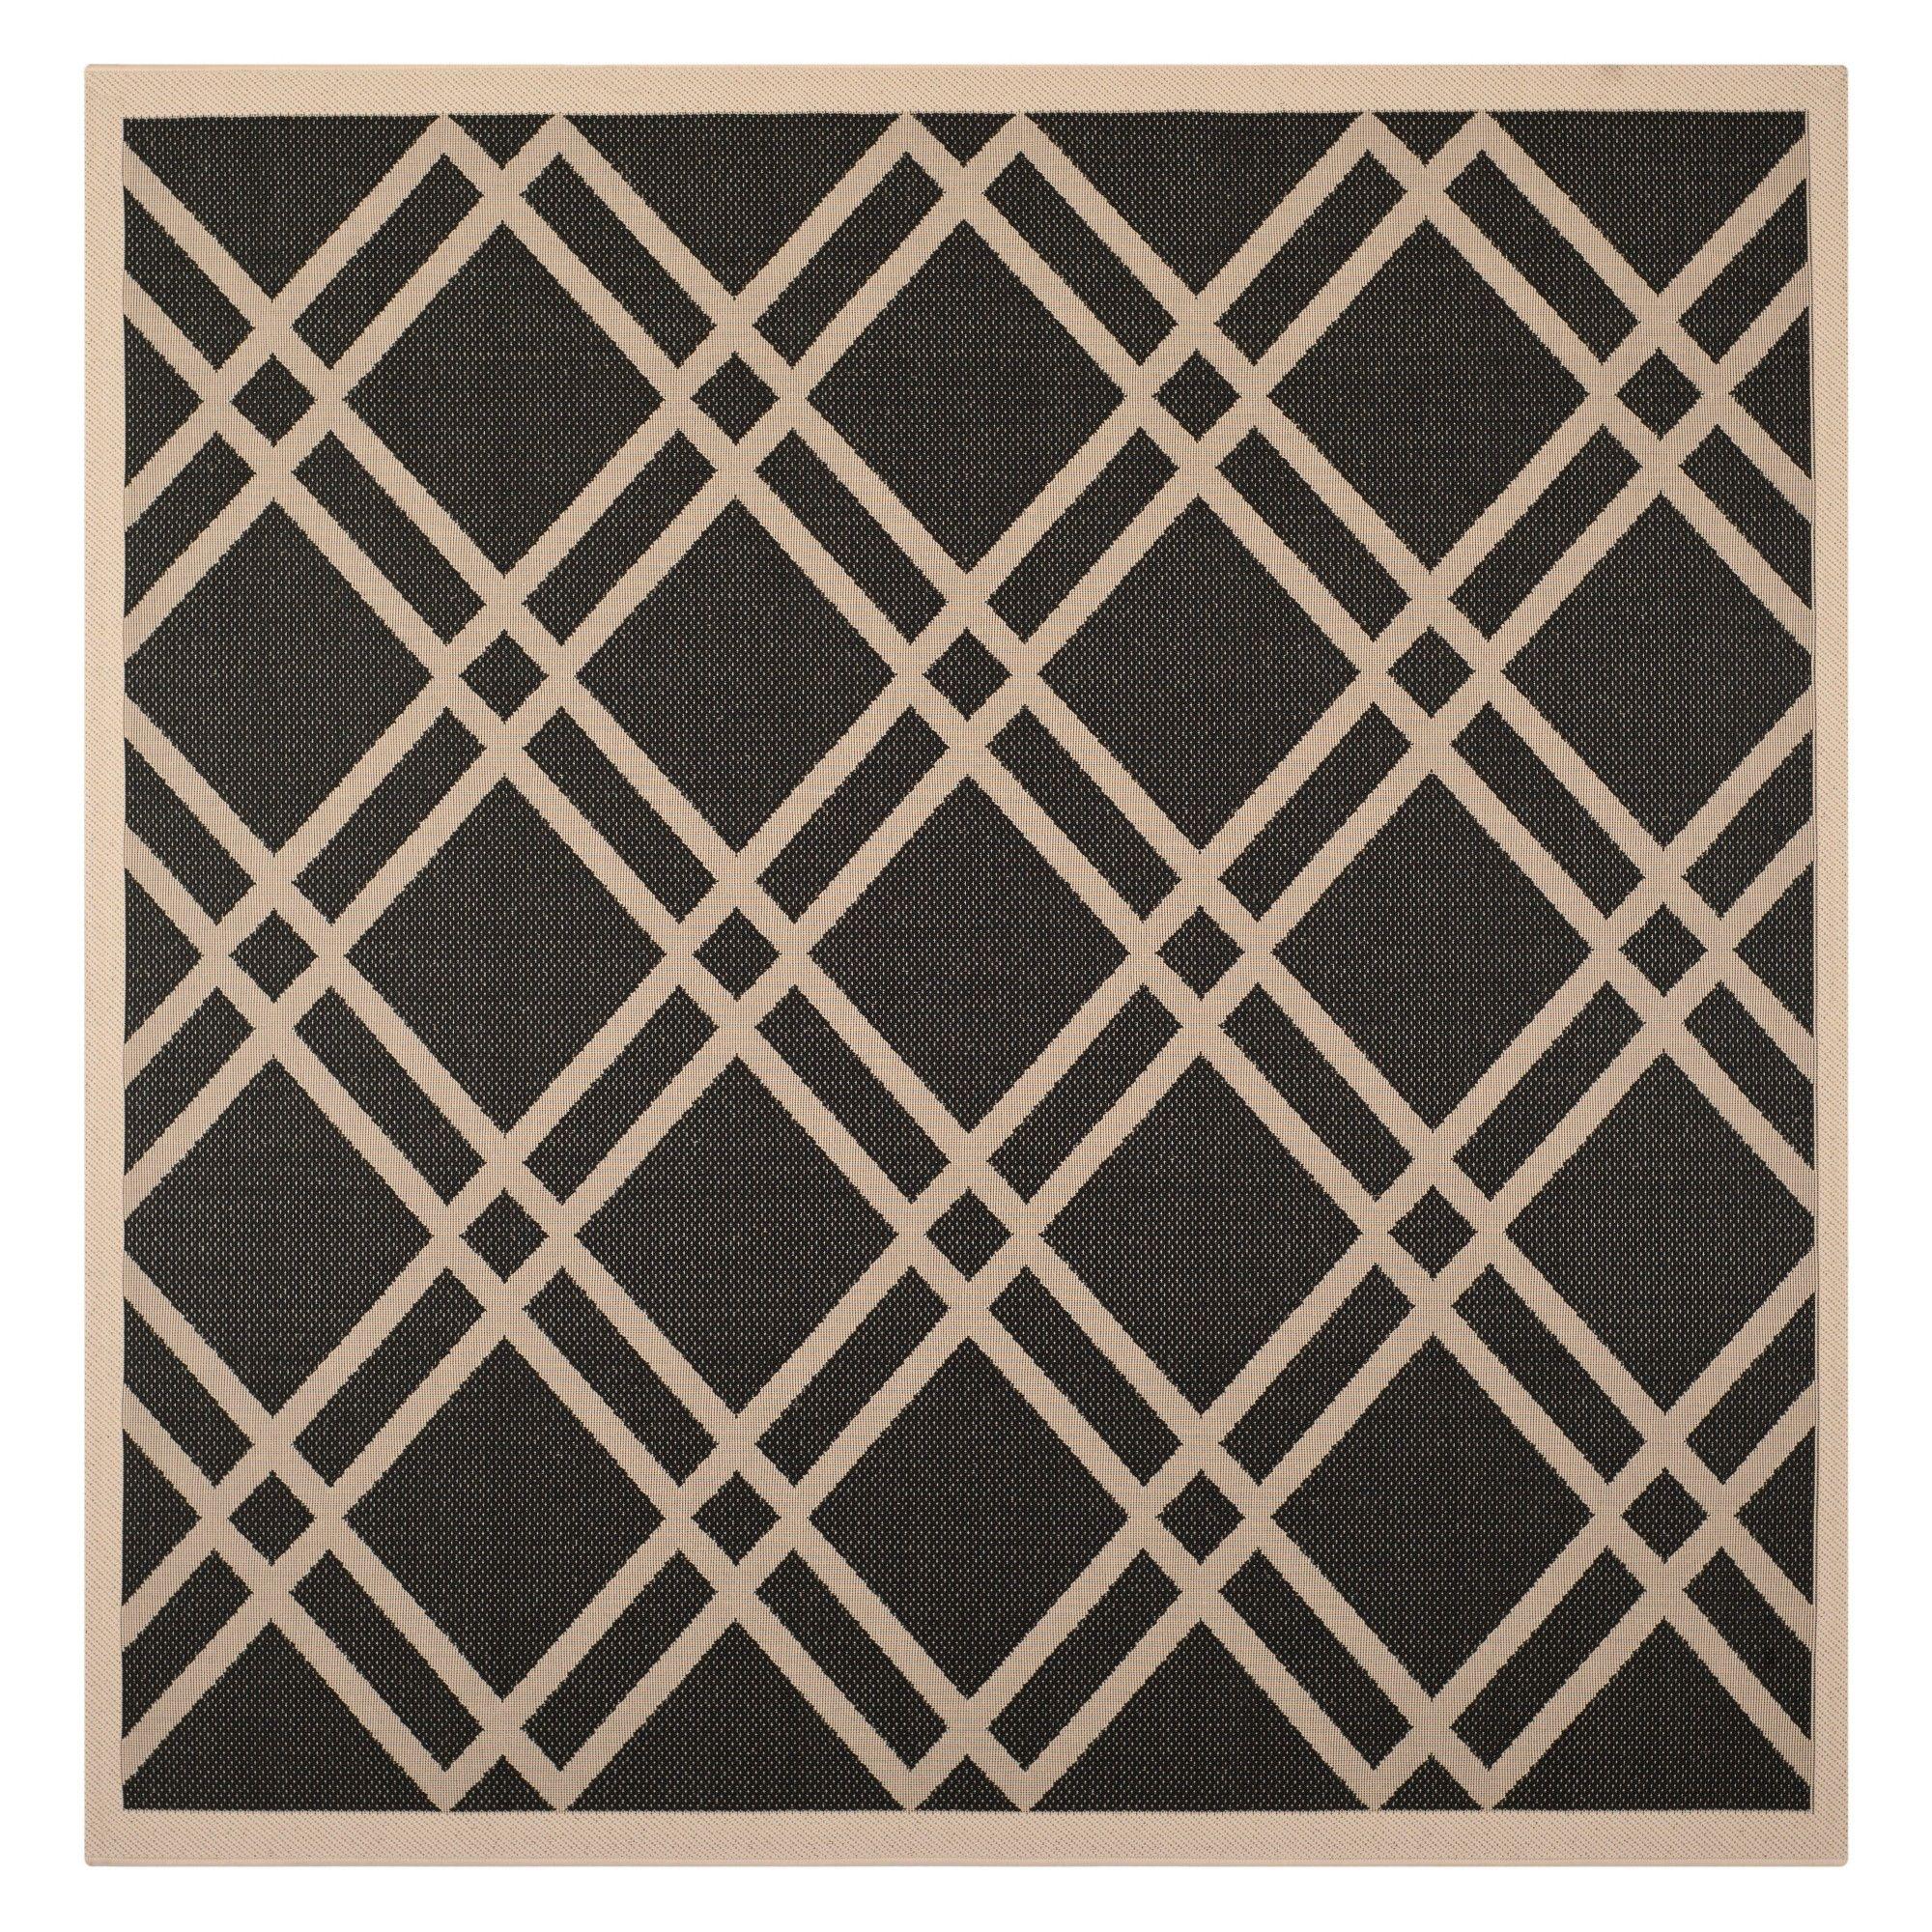 7 10 X7 10 Square Karwina Outdoor Patio Rug Black Beige Safavieh Patio Rugs Outdoor Rugs Patio Outdoor Rugs